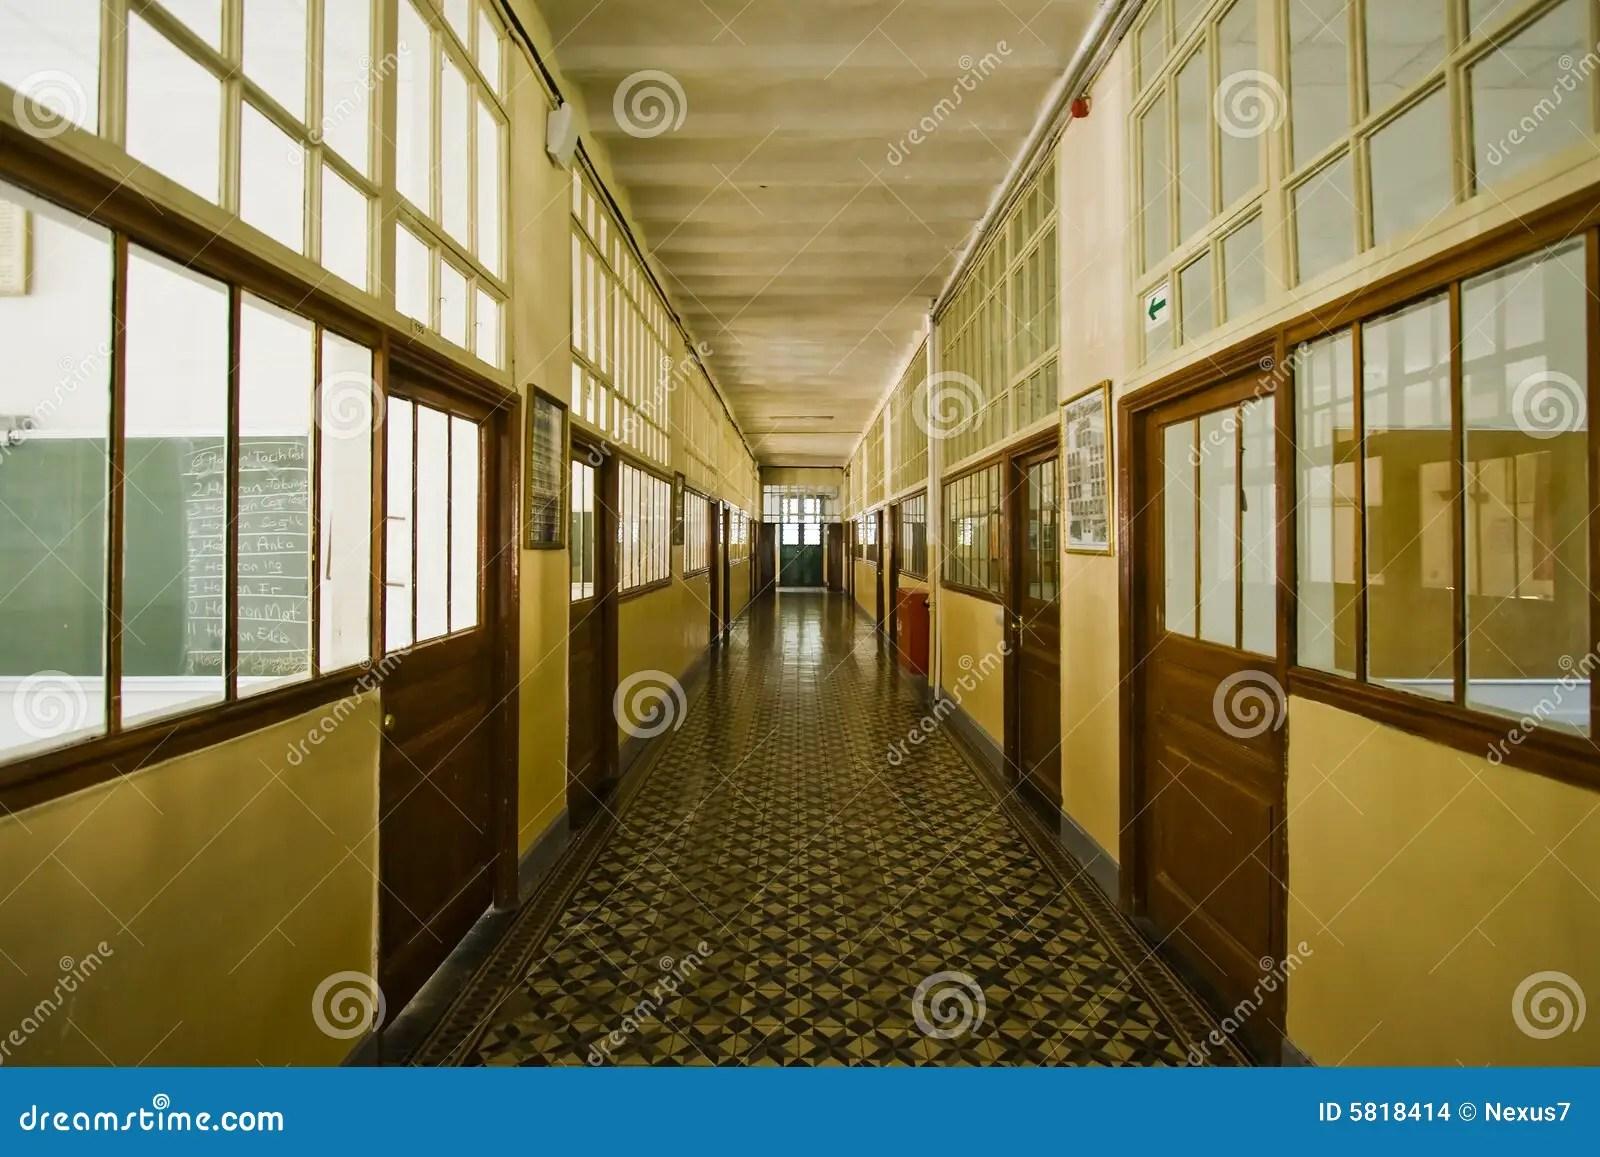 Old School Corridor Stock Images  Image 5818414